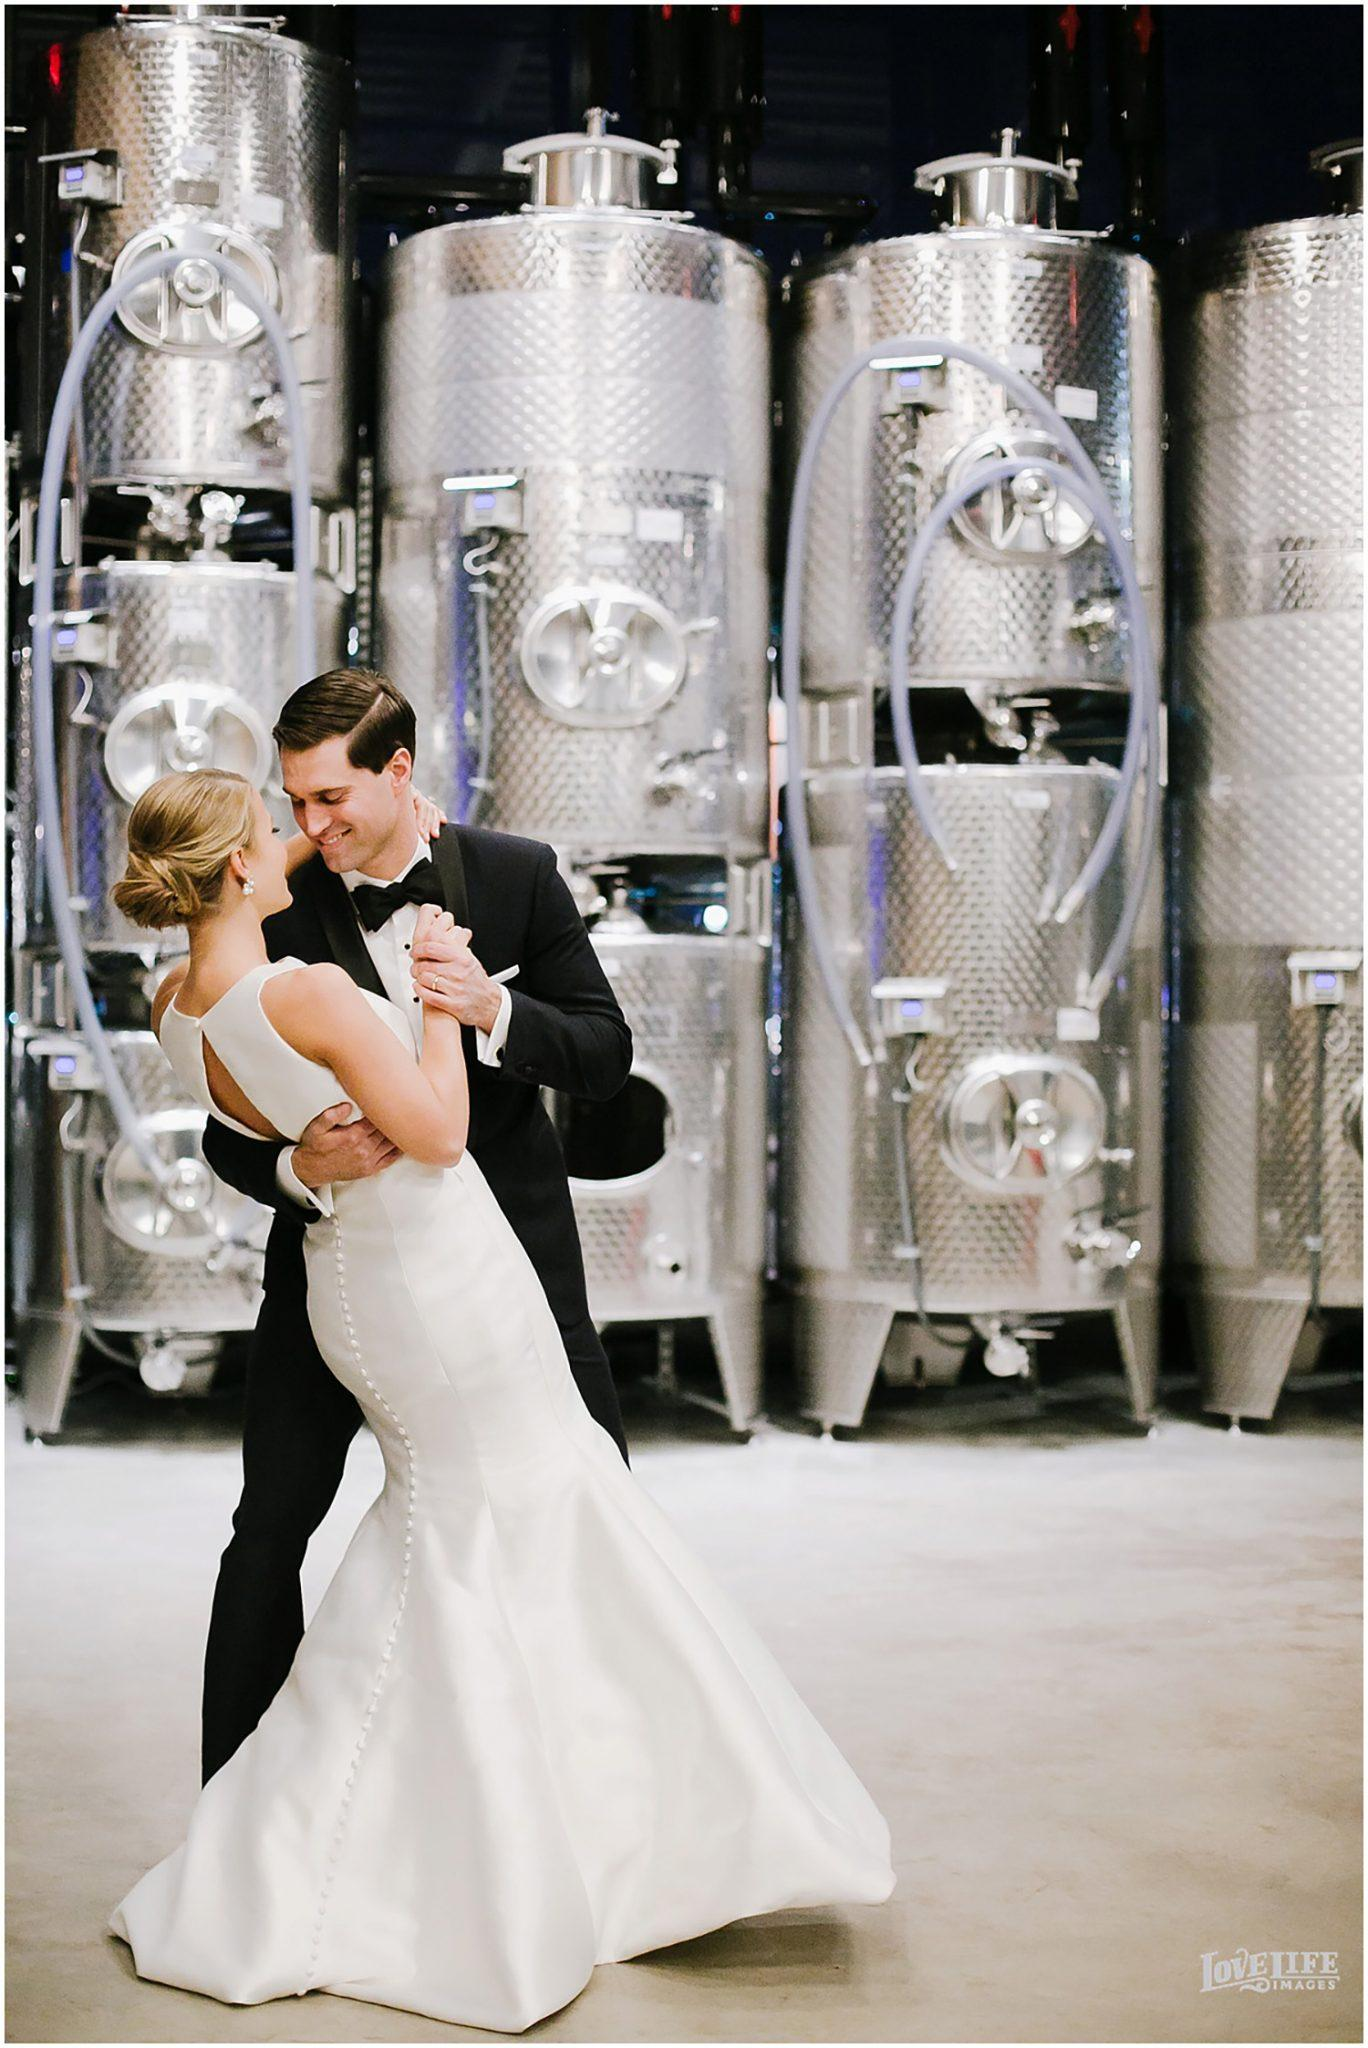 Gallery-Couple-Winery-Tanks.jpg